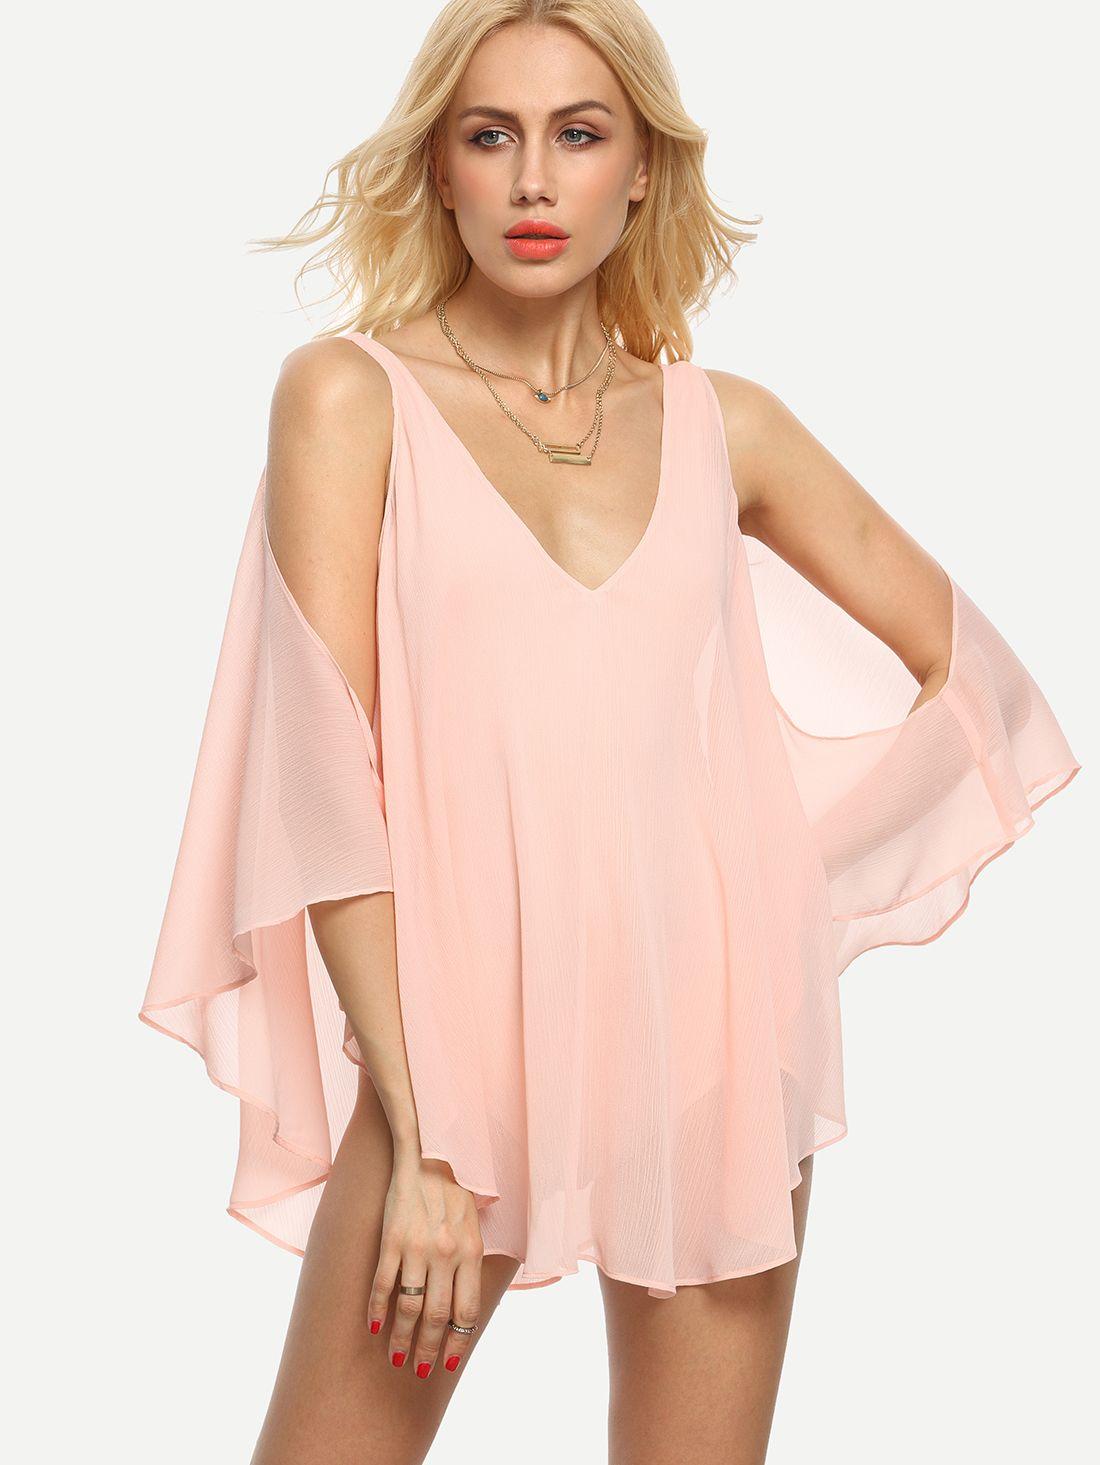 Blusa escote V hombro frío sin espalda -rosa | Blusas | Pinterest ...